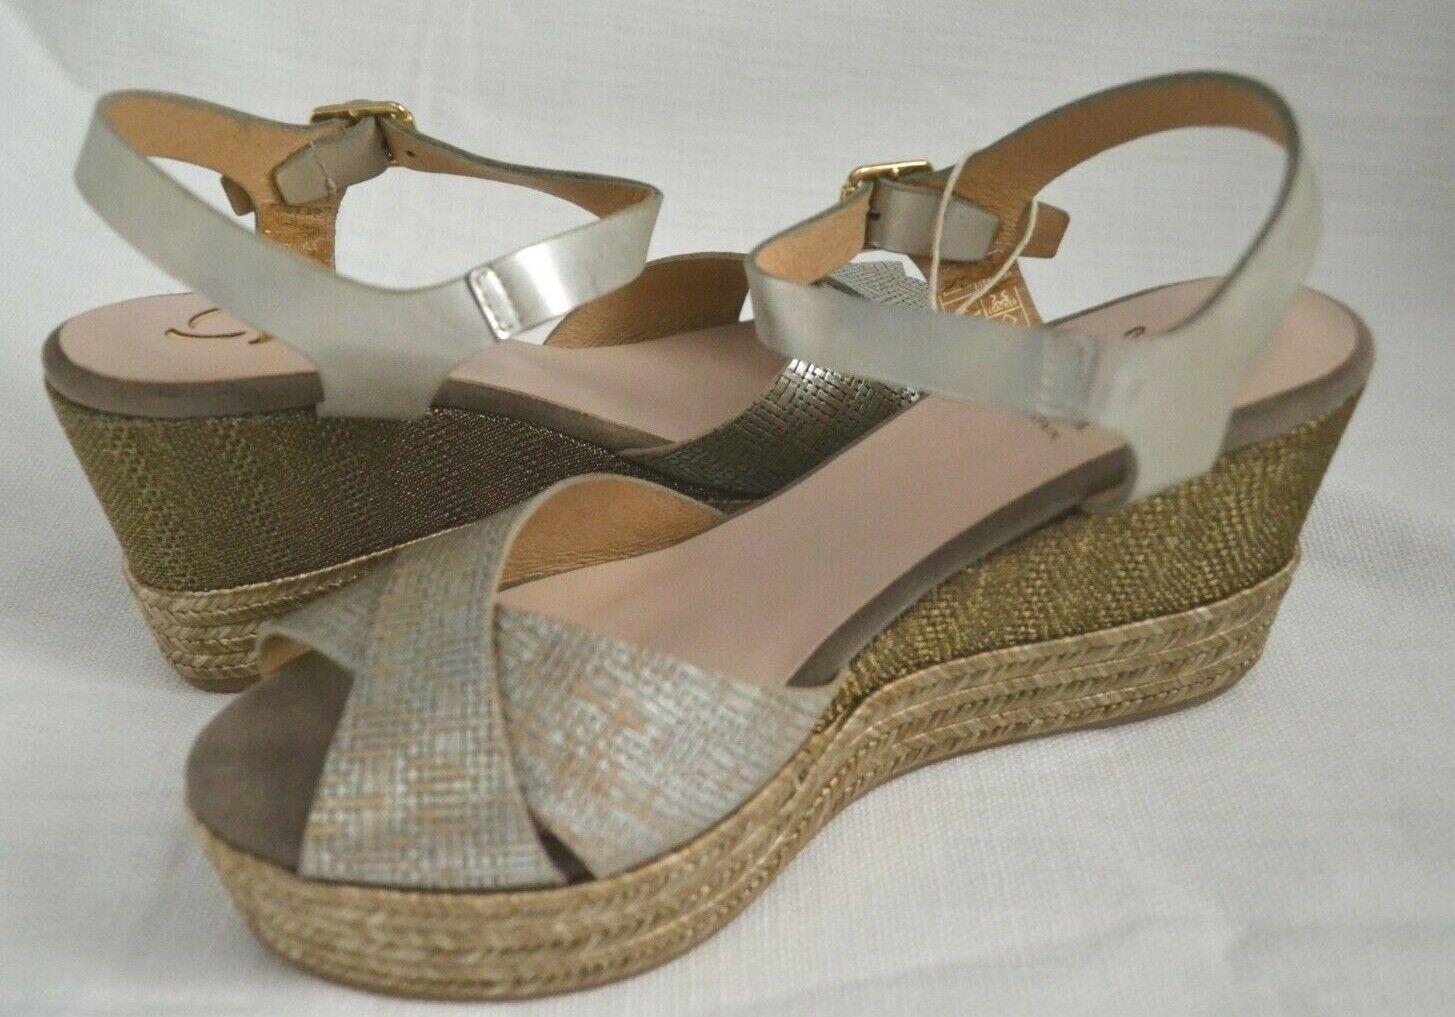 Kanna Women's Espadrilles shoes KV7303 Light Grey Size 38 NIB